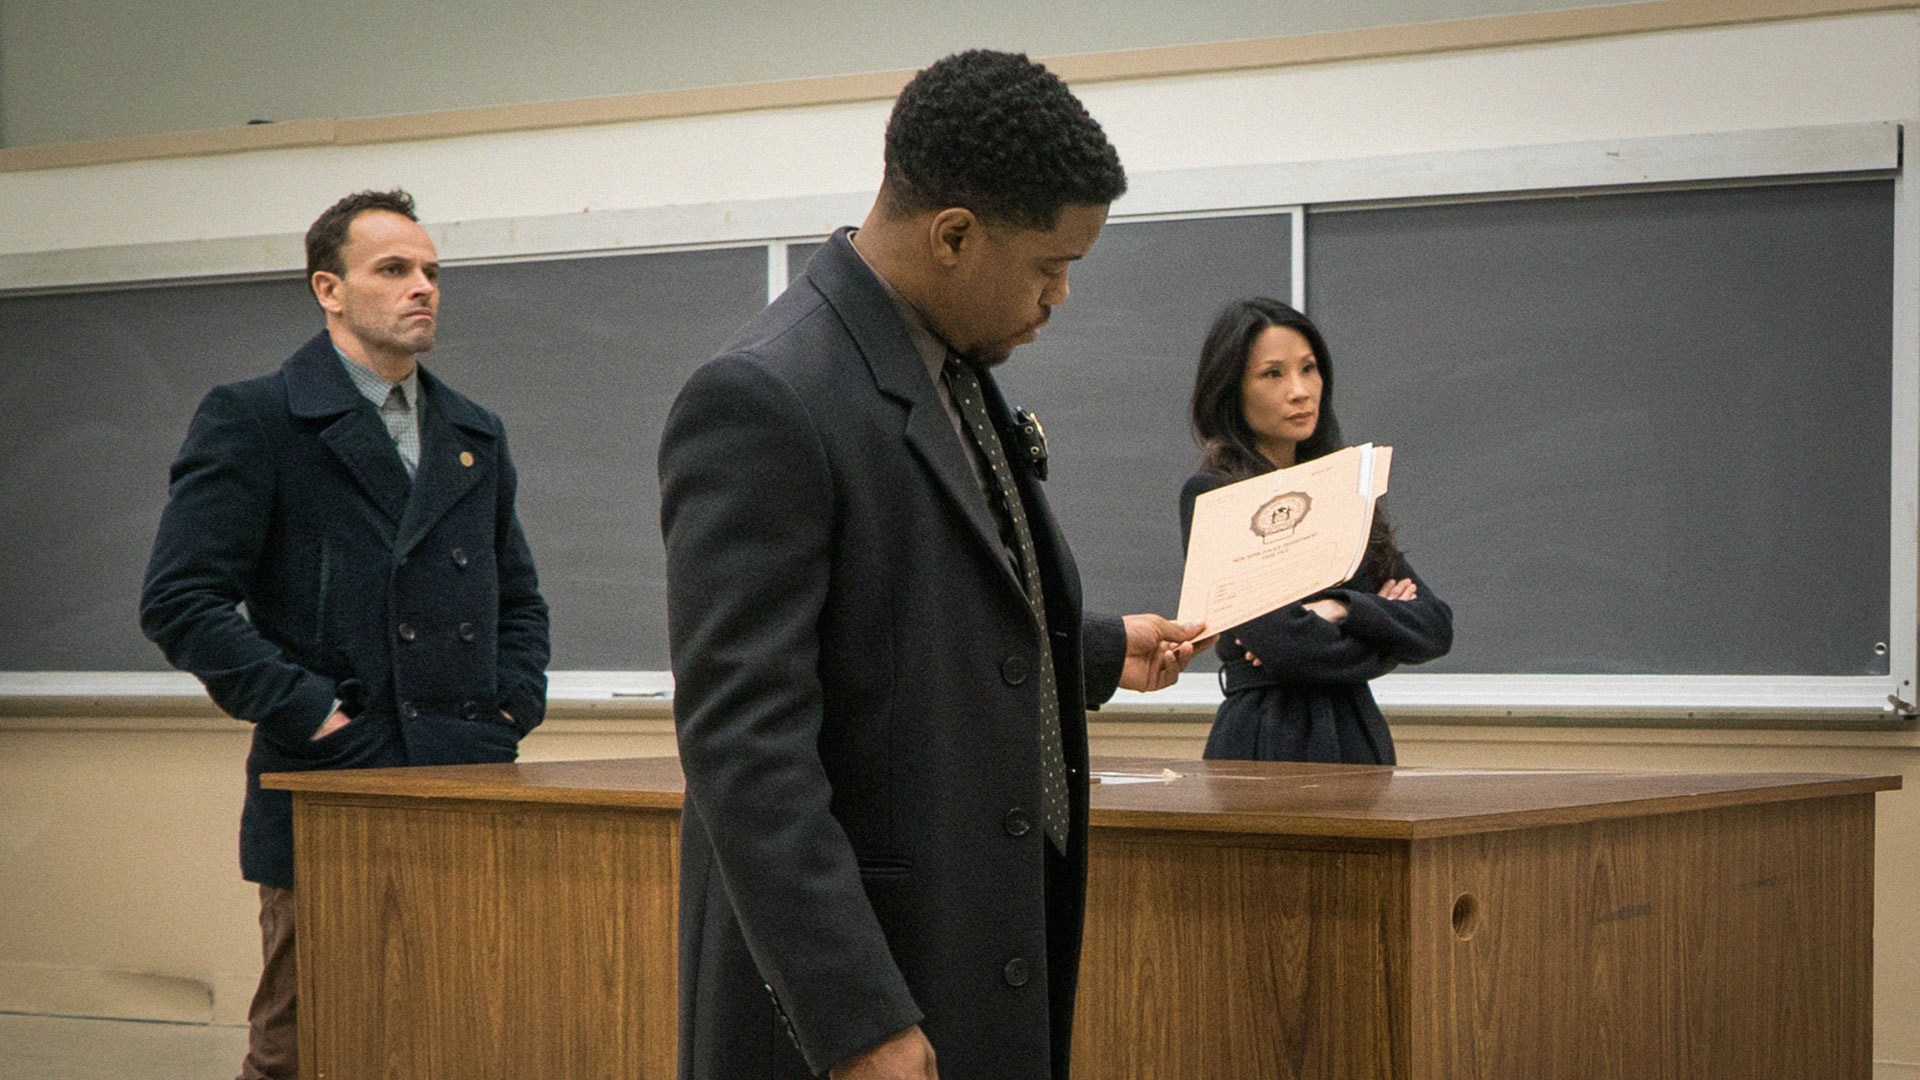 Jonny Lee Miller as Sherlock Holmes, Jon Michael Hill as Detective Marcus Bell, and Lucy Liu as Dr. Joan Watson